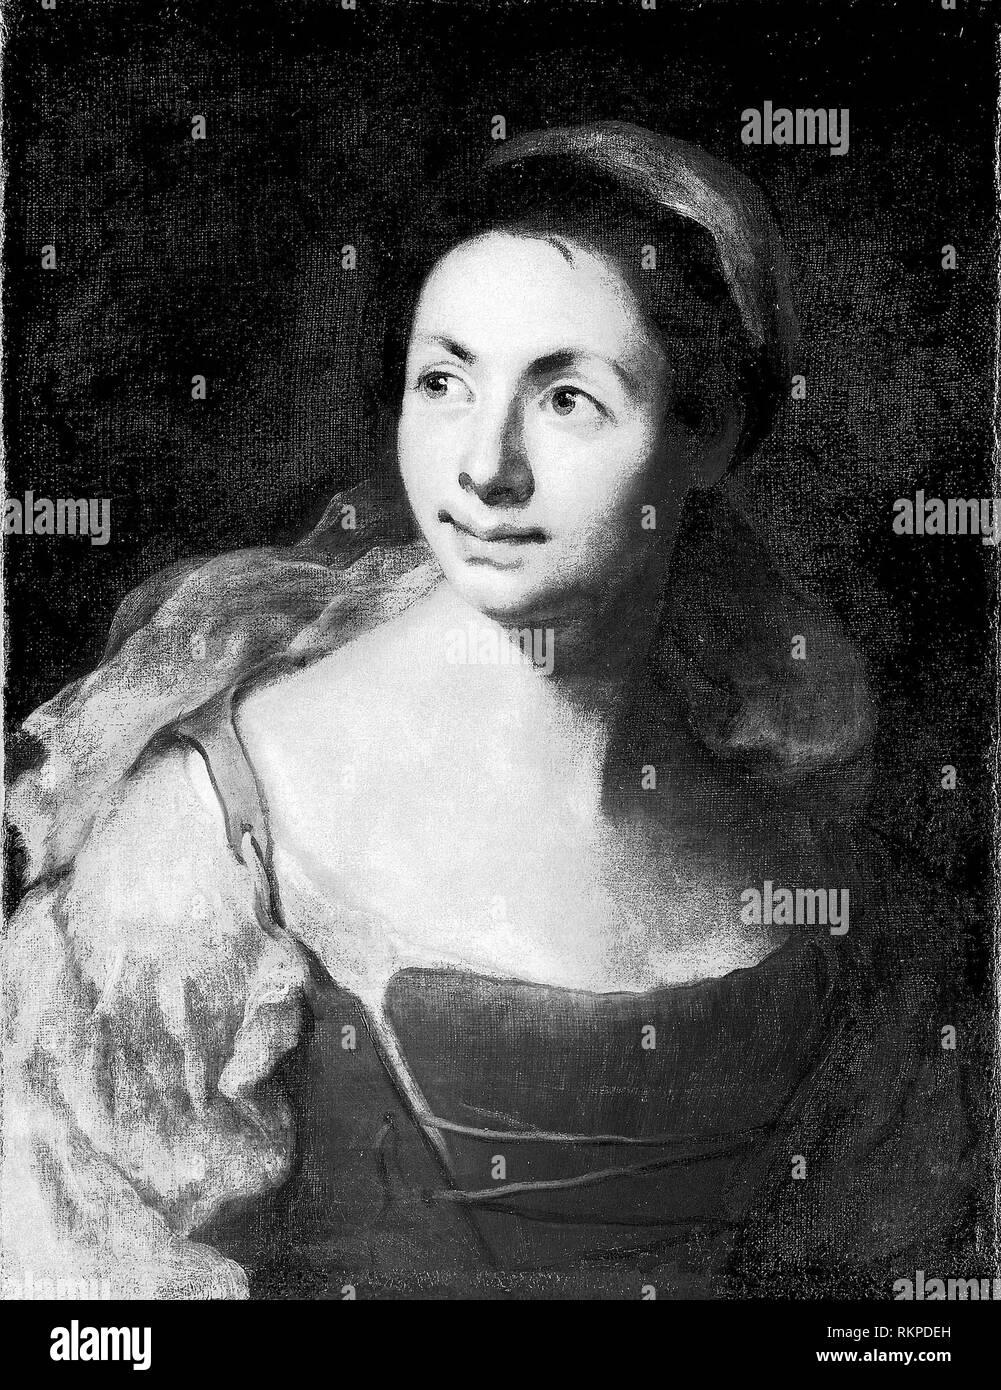 Portrait of a Girl - c  1700 - Francesco Solimena